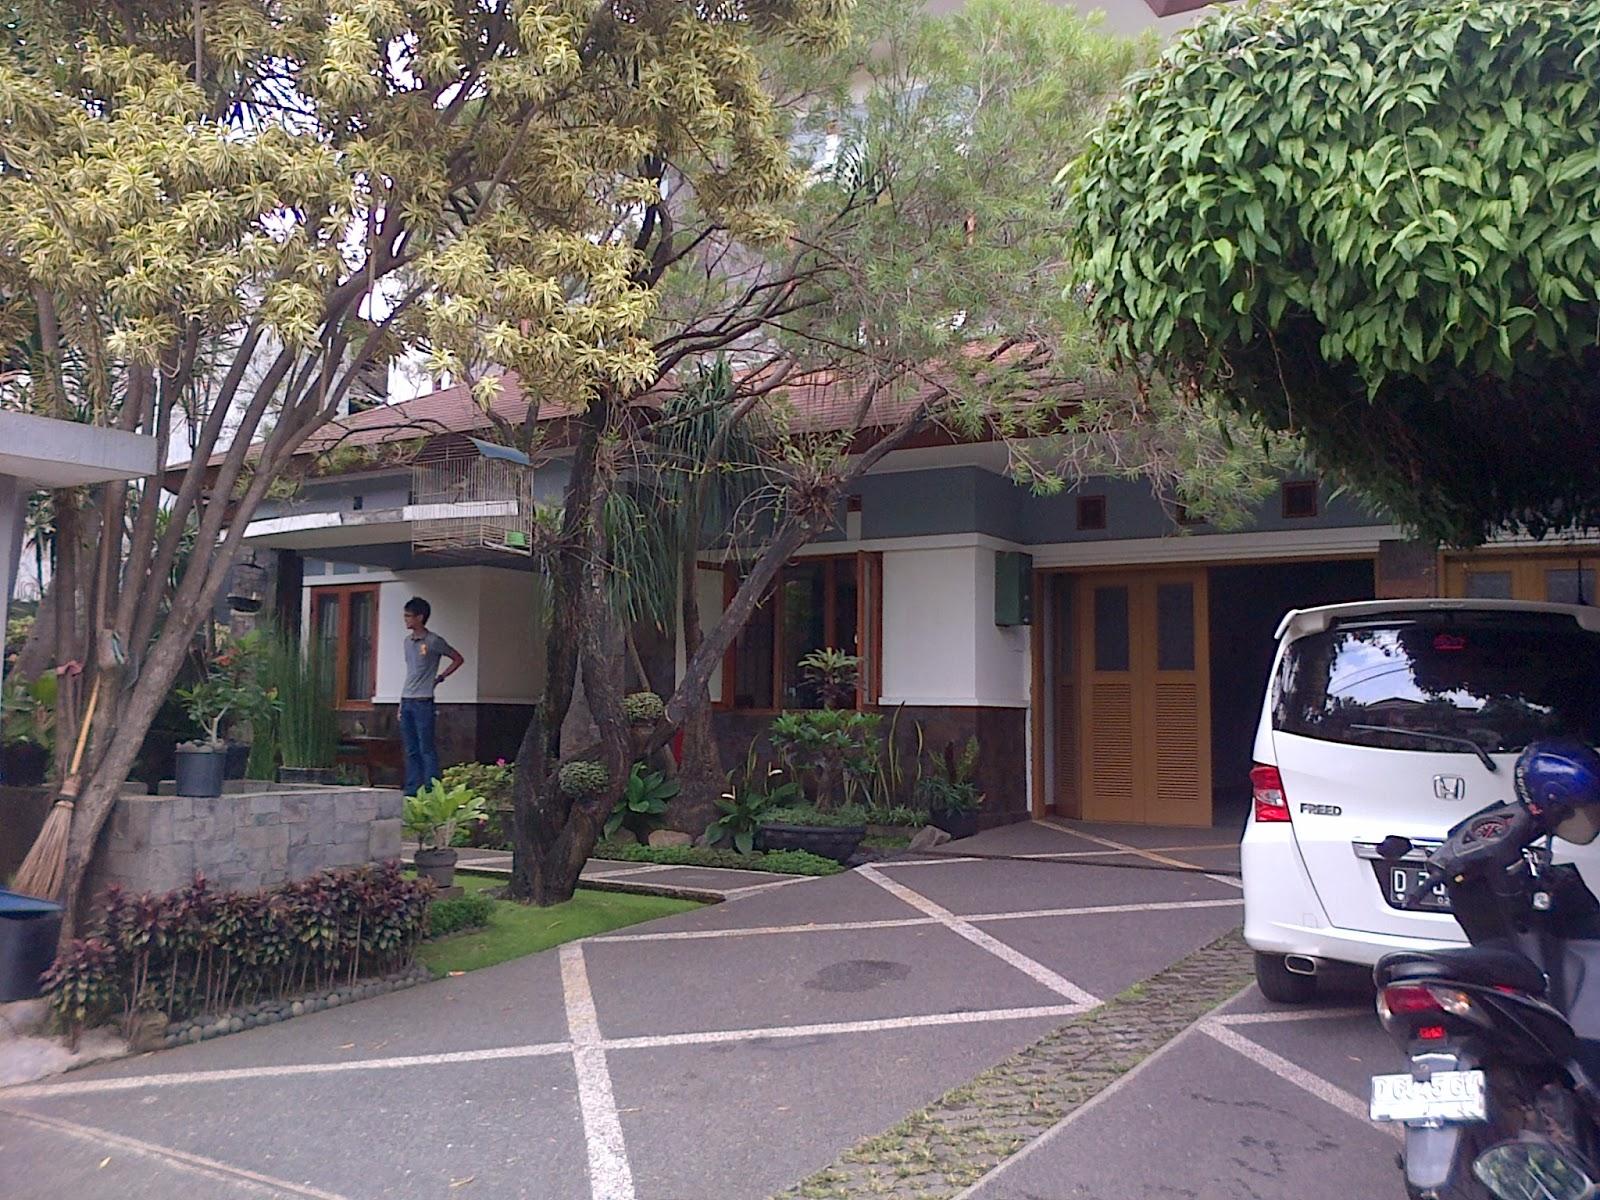 Rumah Bandung: SOLD OUT JUAL RUMAH LUX DI SUKAMULYA BANDUNG